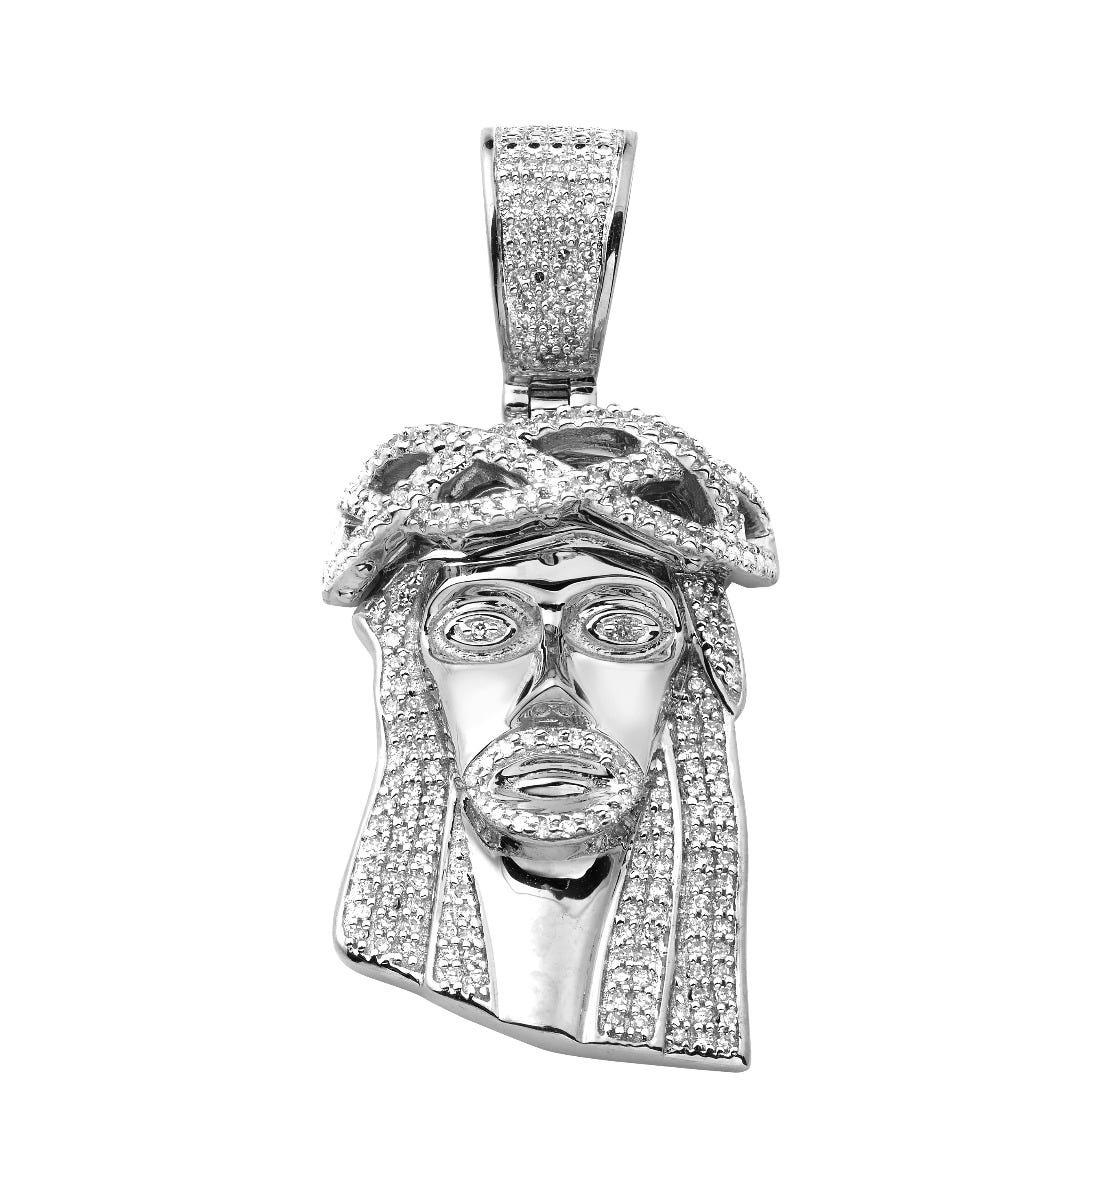 Diamond 1/2ctw. Jesus Silhouette Face Piece Pendant in 10k White Gold